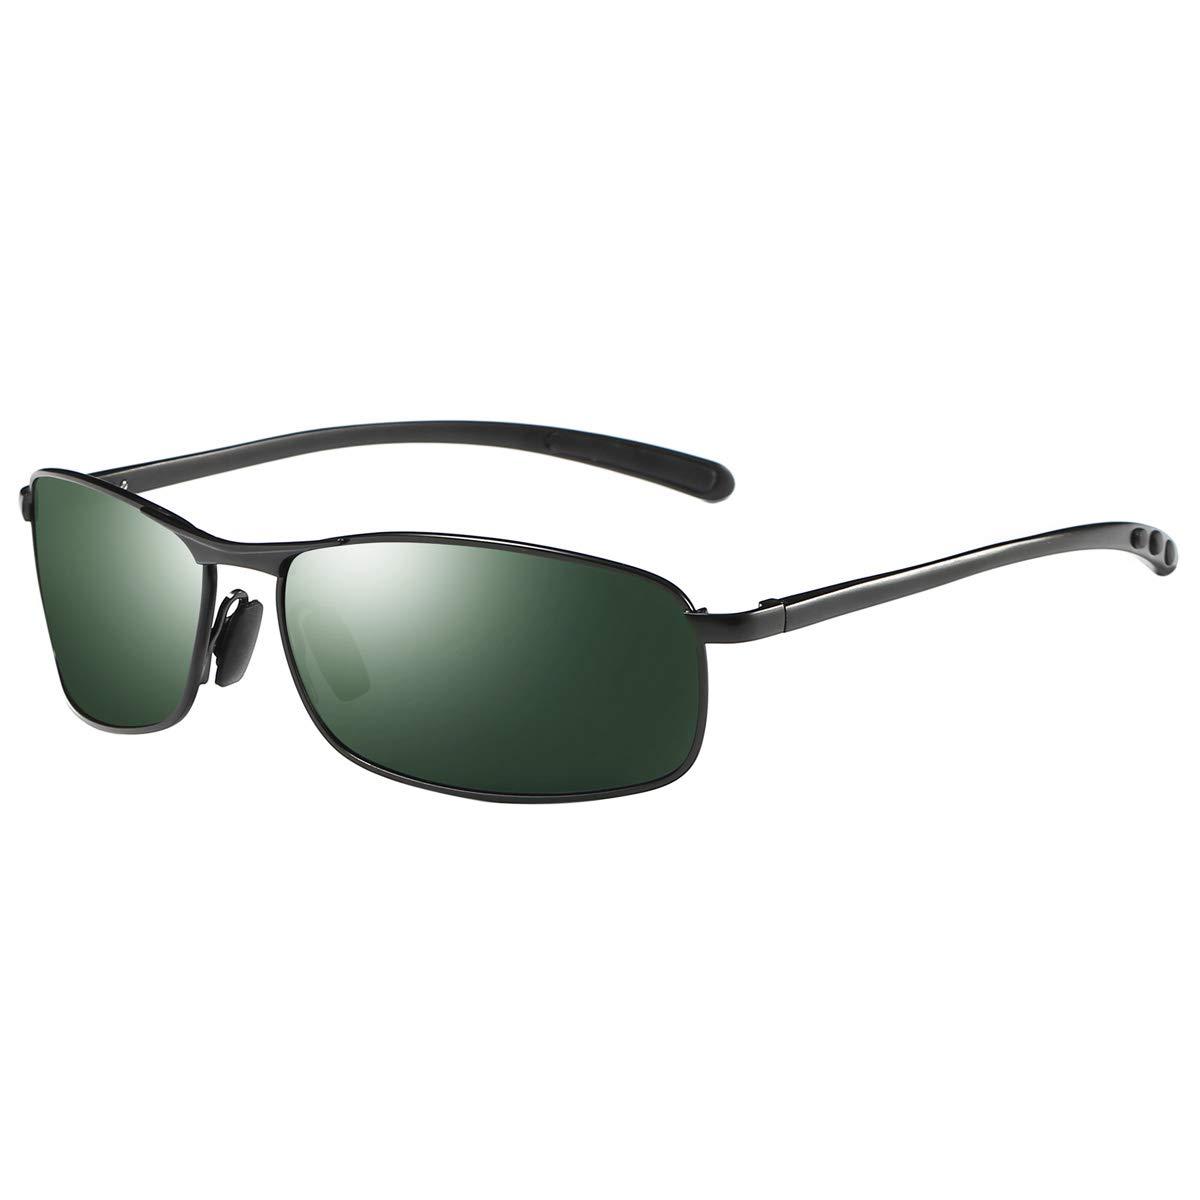 7c84f42654 Amazon.com  ZHILE Rectangular Polarized Sunglasses Al-Mg Alloy Temple  Spring Hinge UV400 (Black